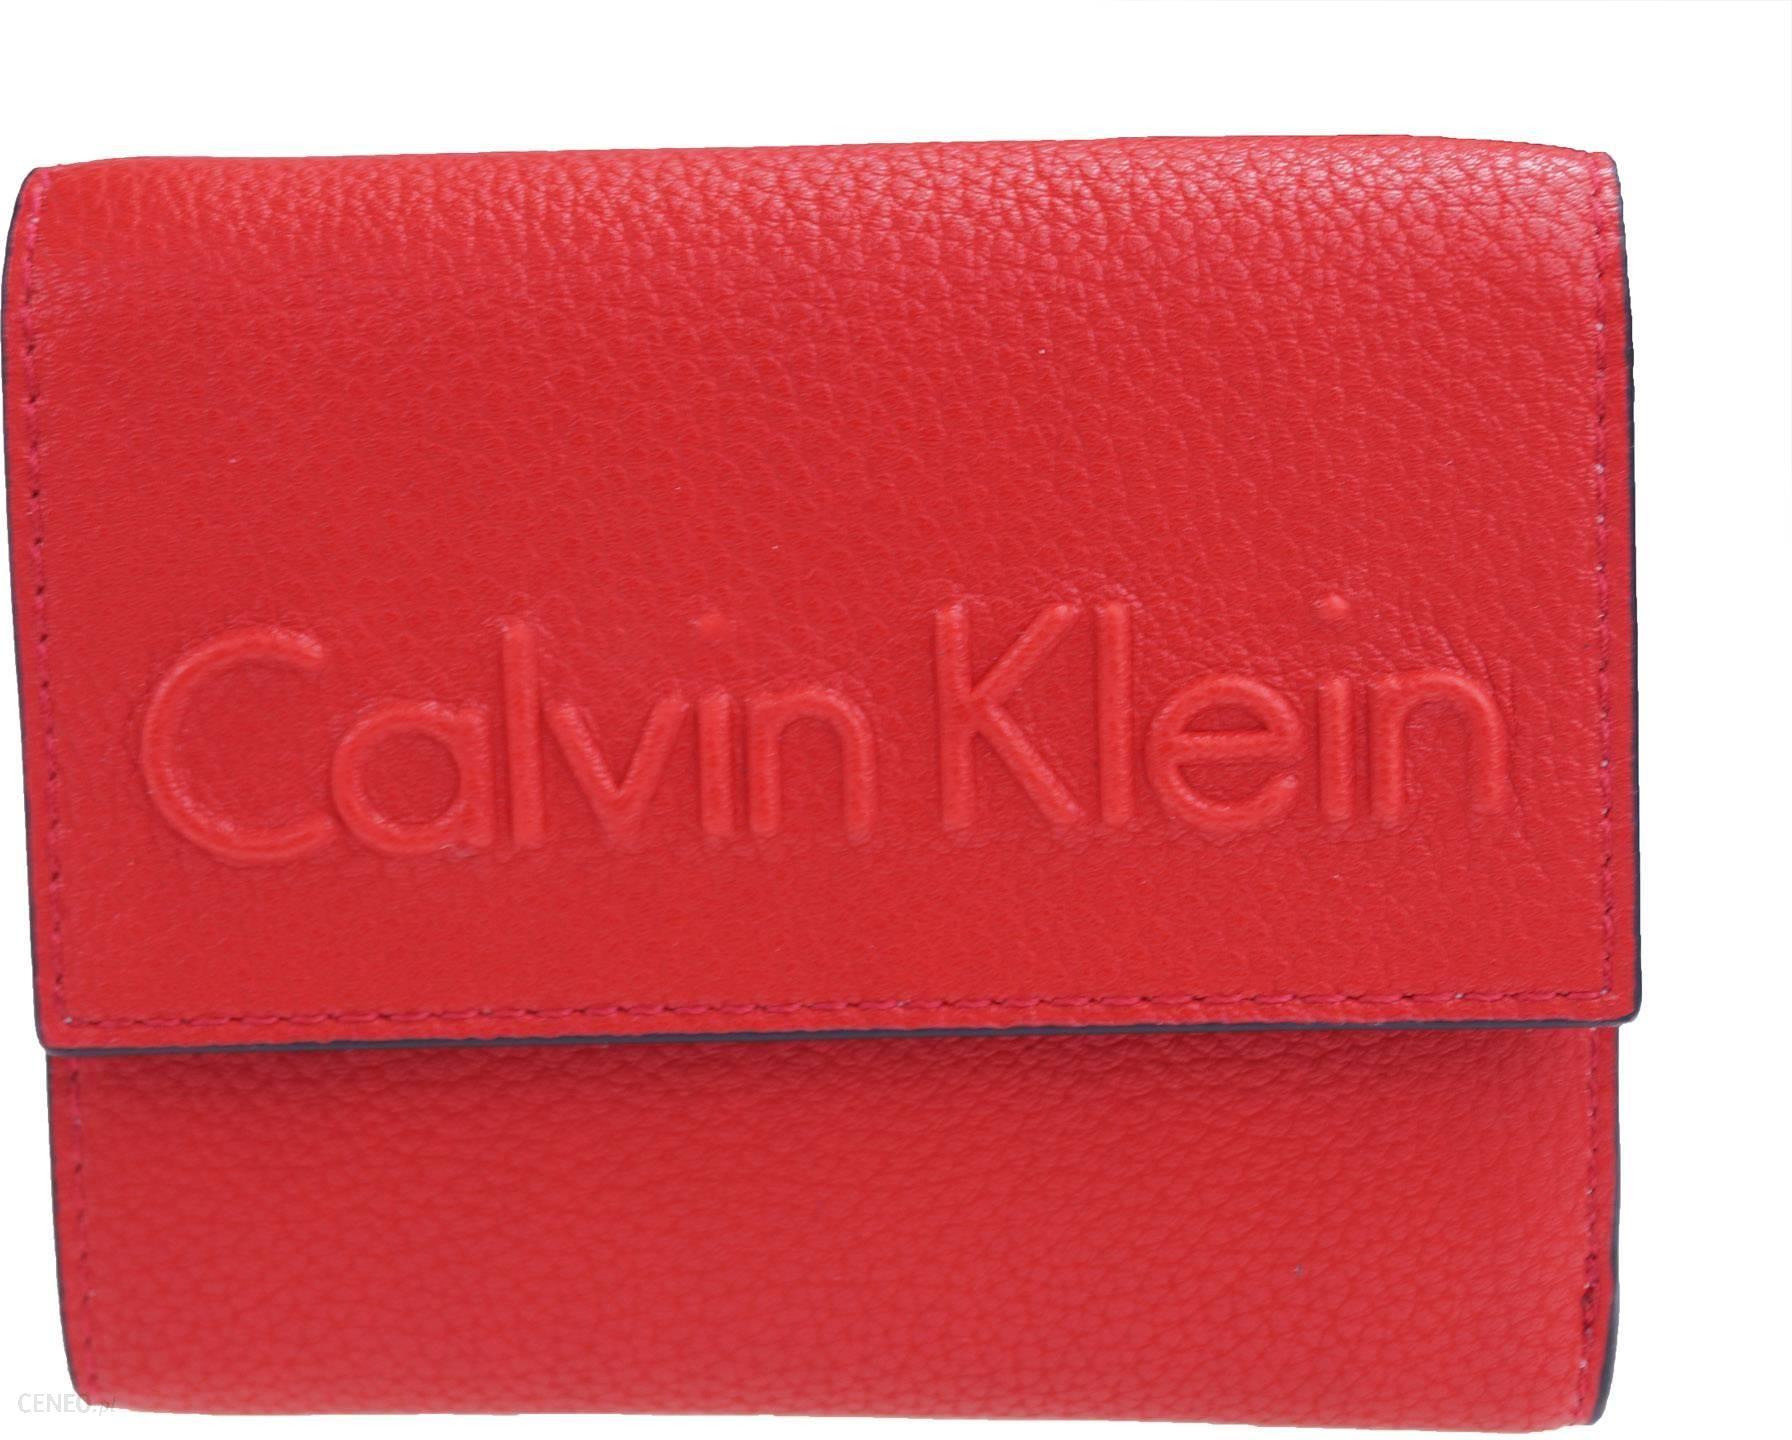 c55cfc9ab603d Portfel Calvin Klein Edge Medium Trifold - Ceny i opinie - Ceneo.pl